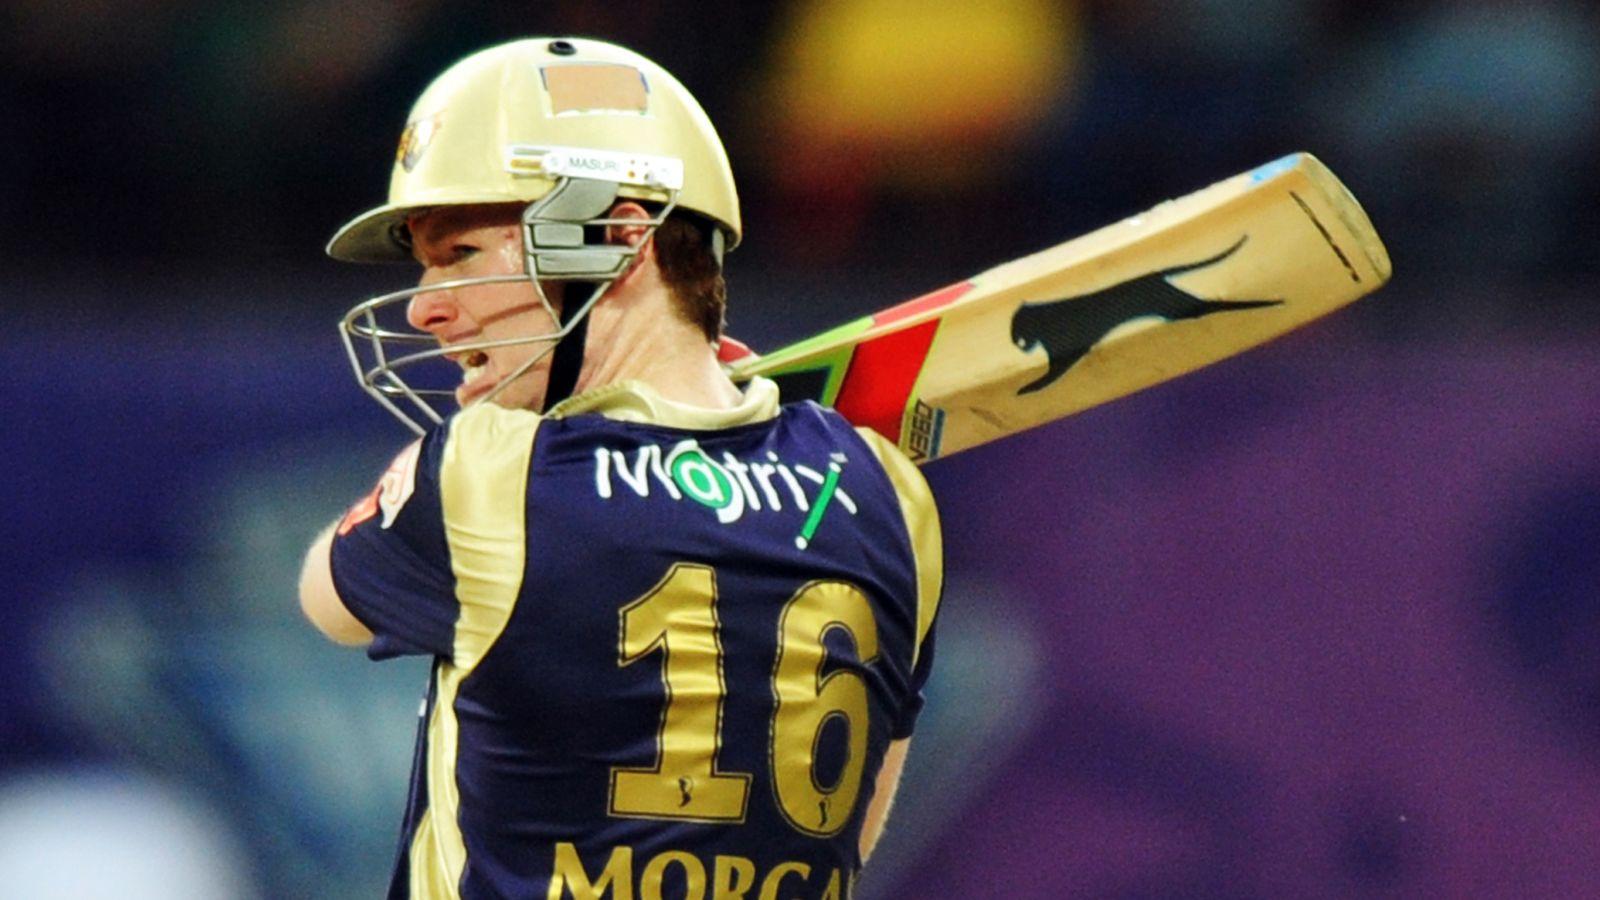 Eoin Morgan replaces Dinesh Karthik as Kolkata Knight Riders captain in IPL  | Cricket News | Sky Sports